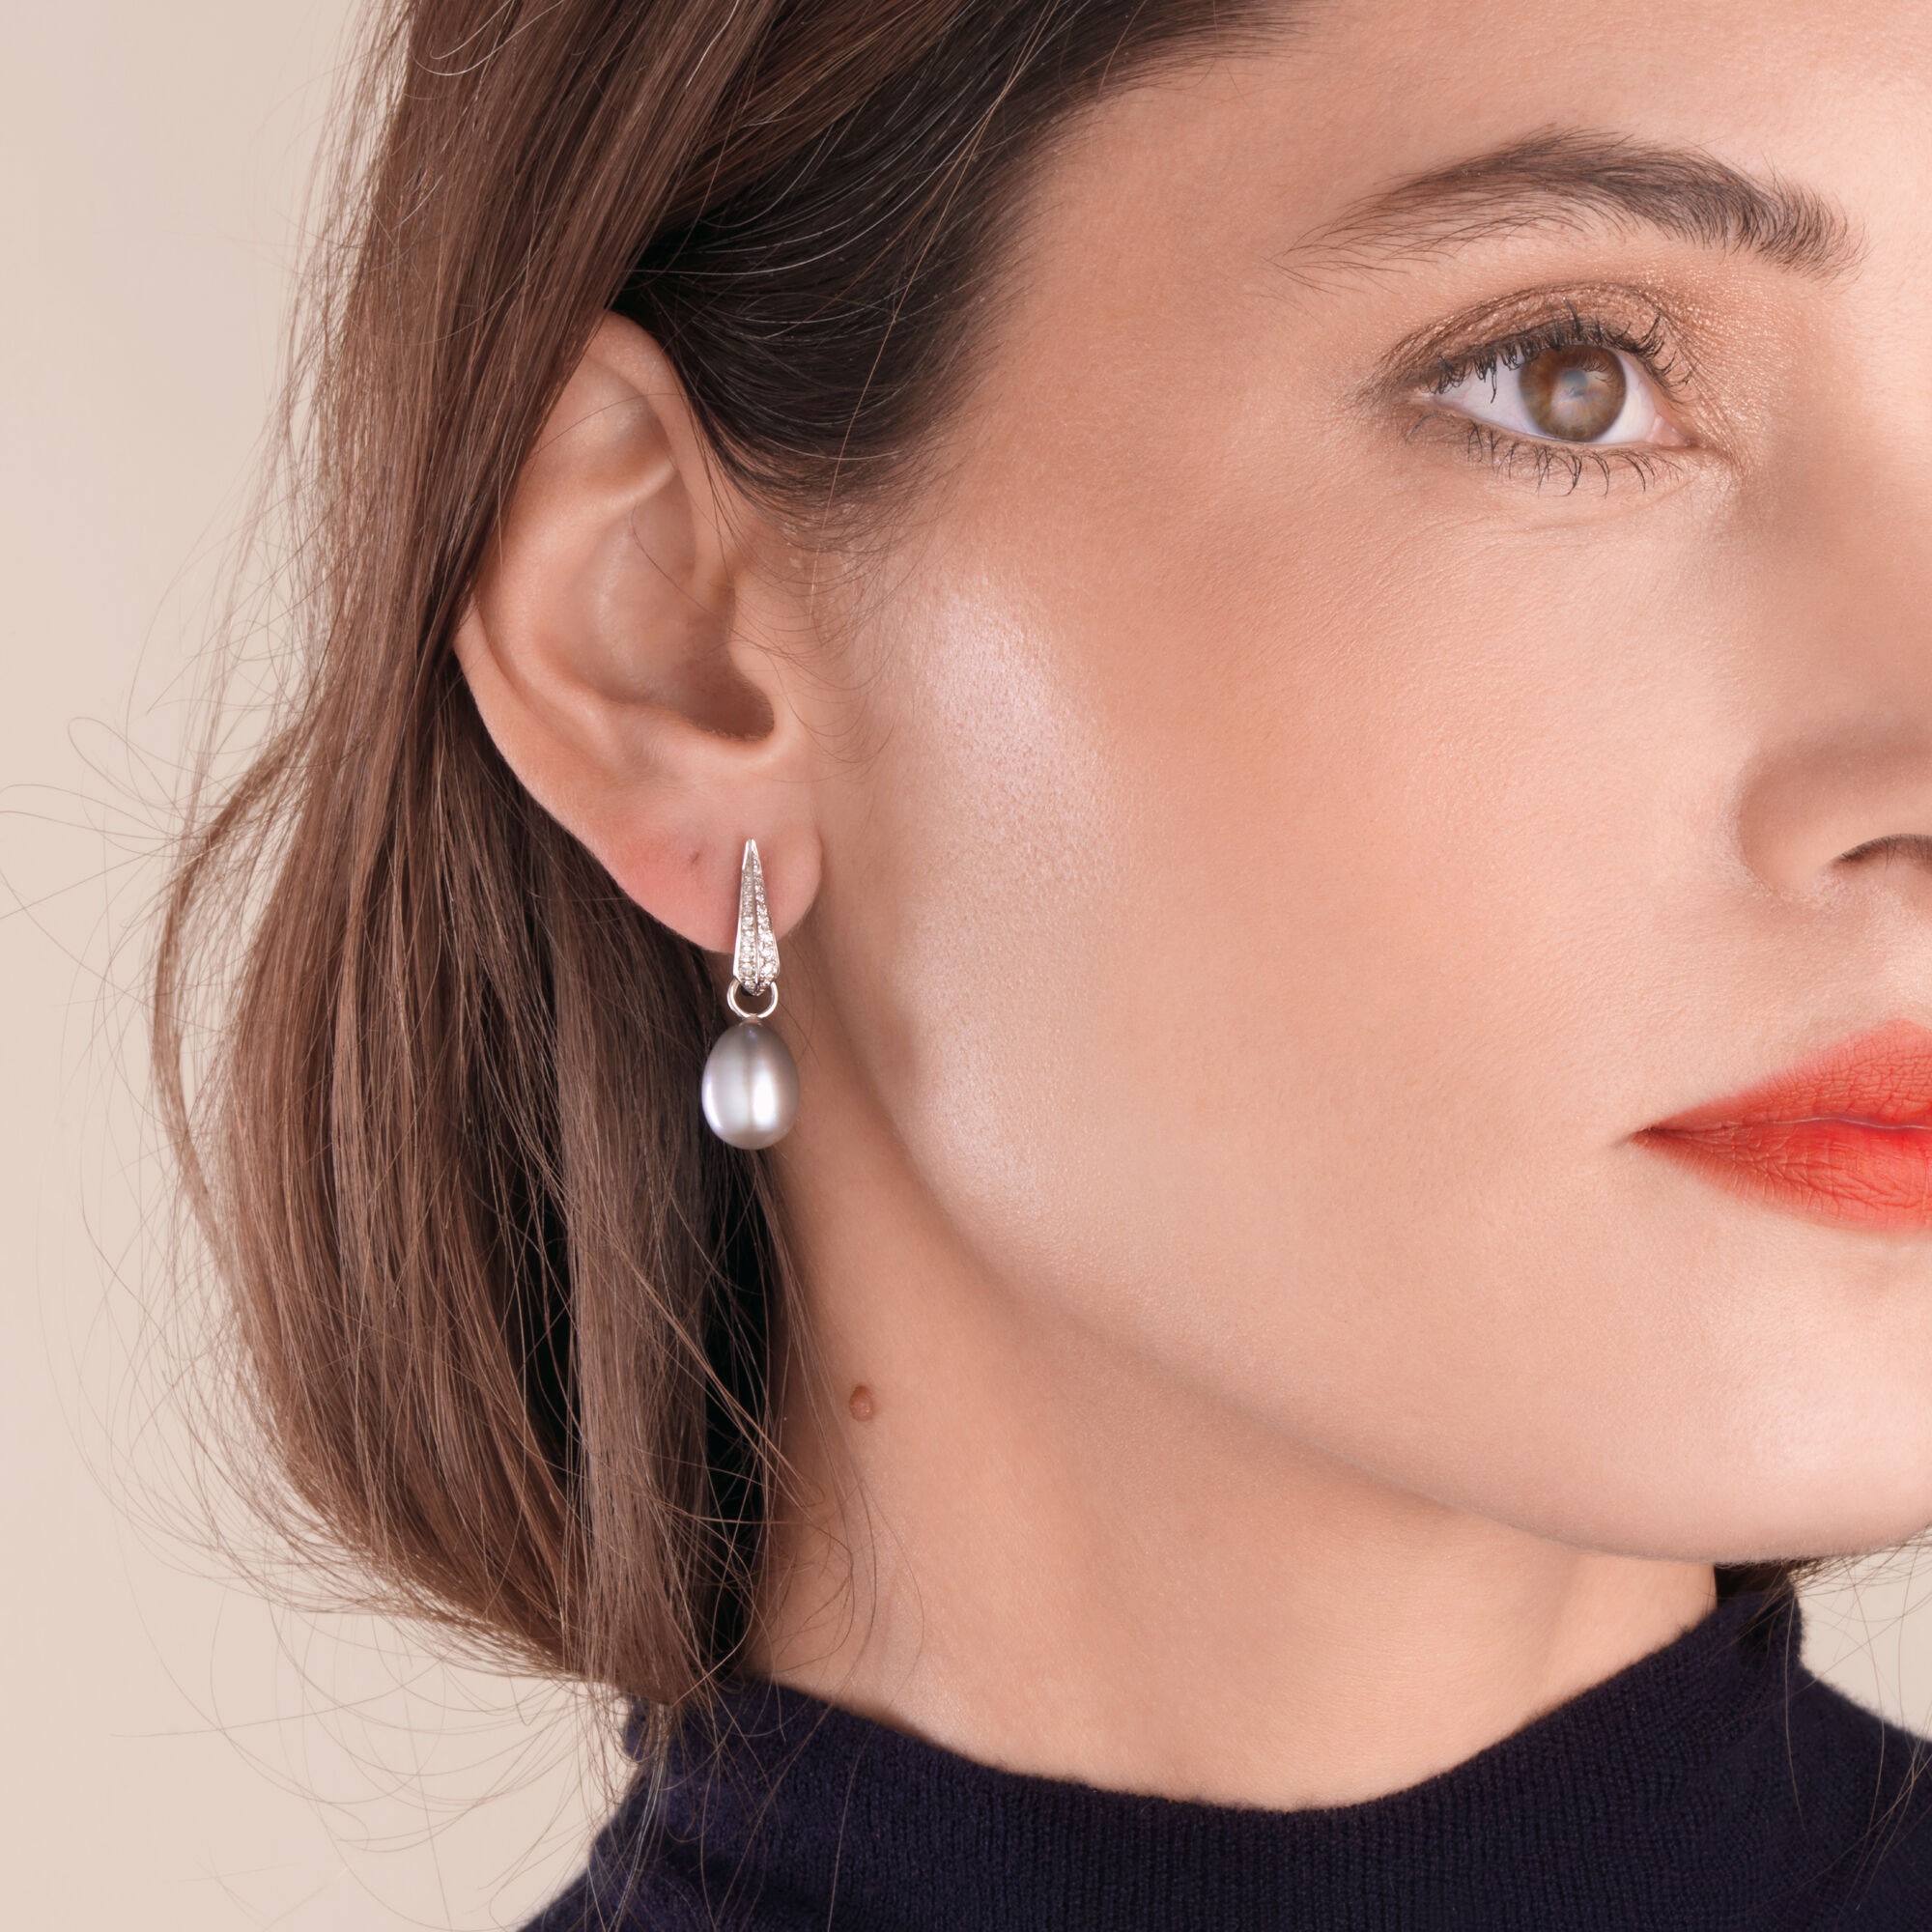 f7e2a7ade 18ct White Gold Diamond Grey Pearl Earrings